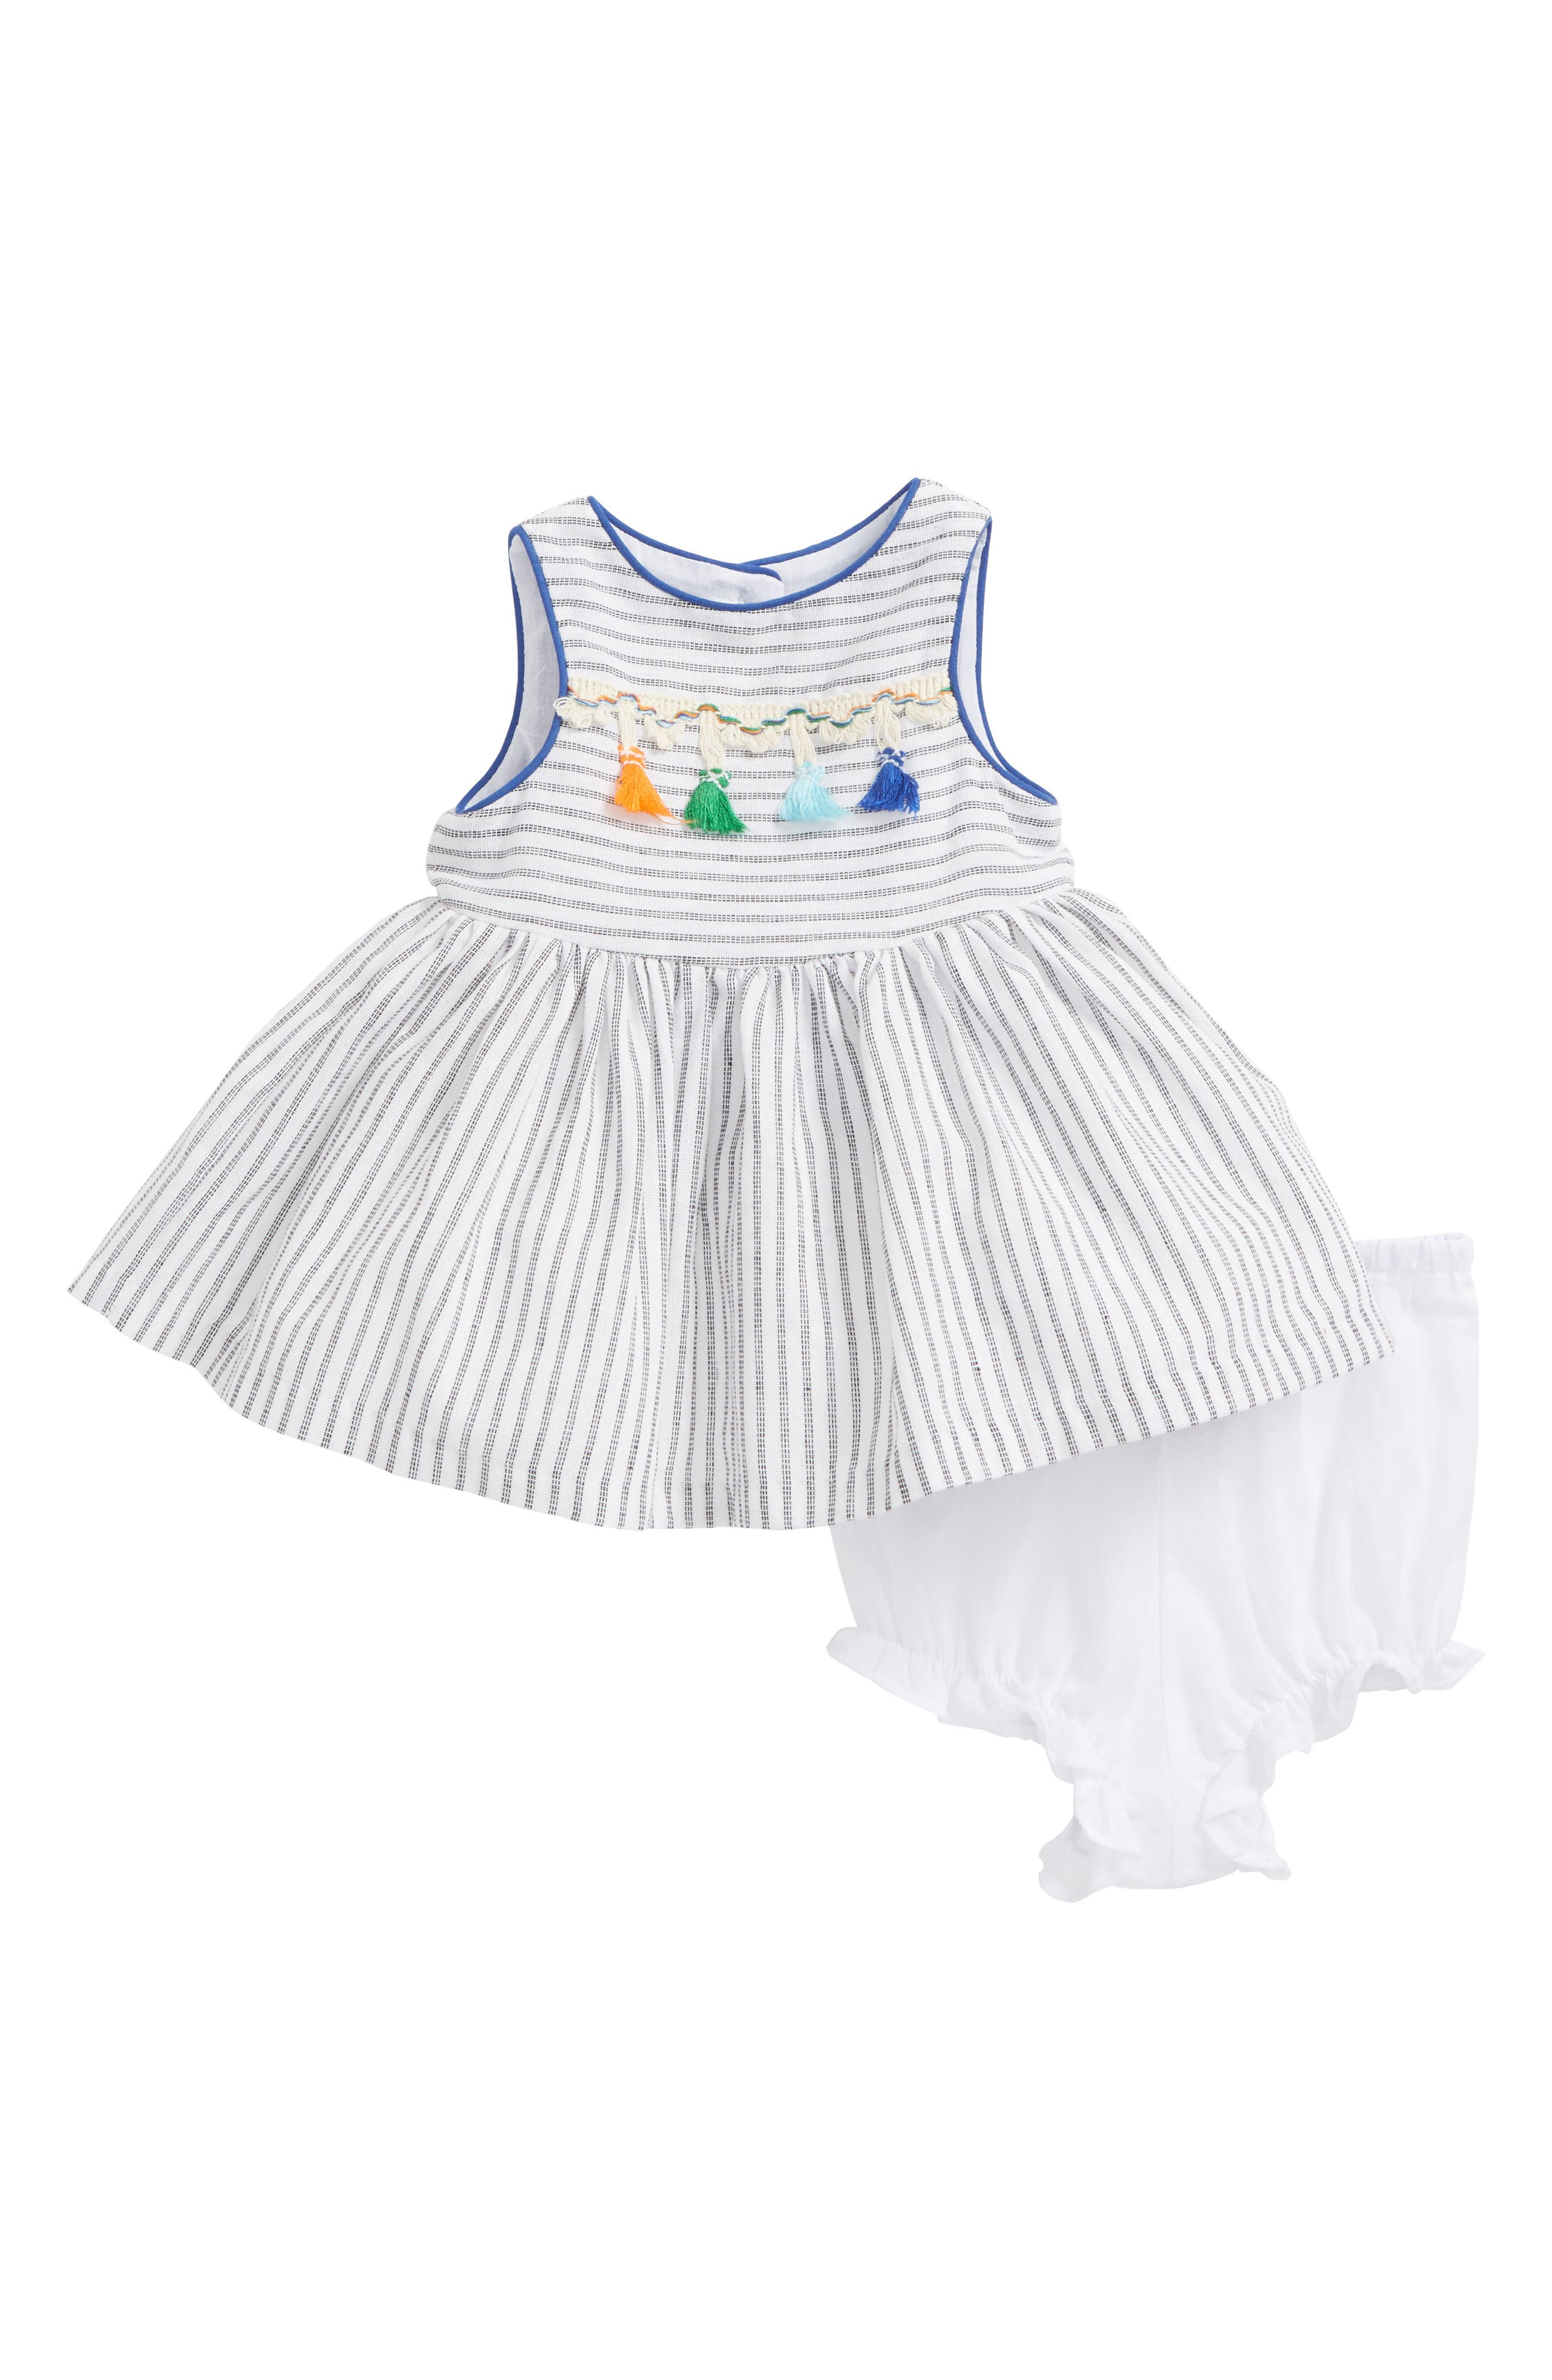 Alternate Image 1 Selected - Pippa & Julie Stripe Tassel Dress (Baby Girls)